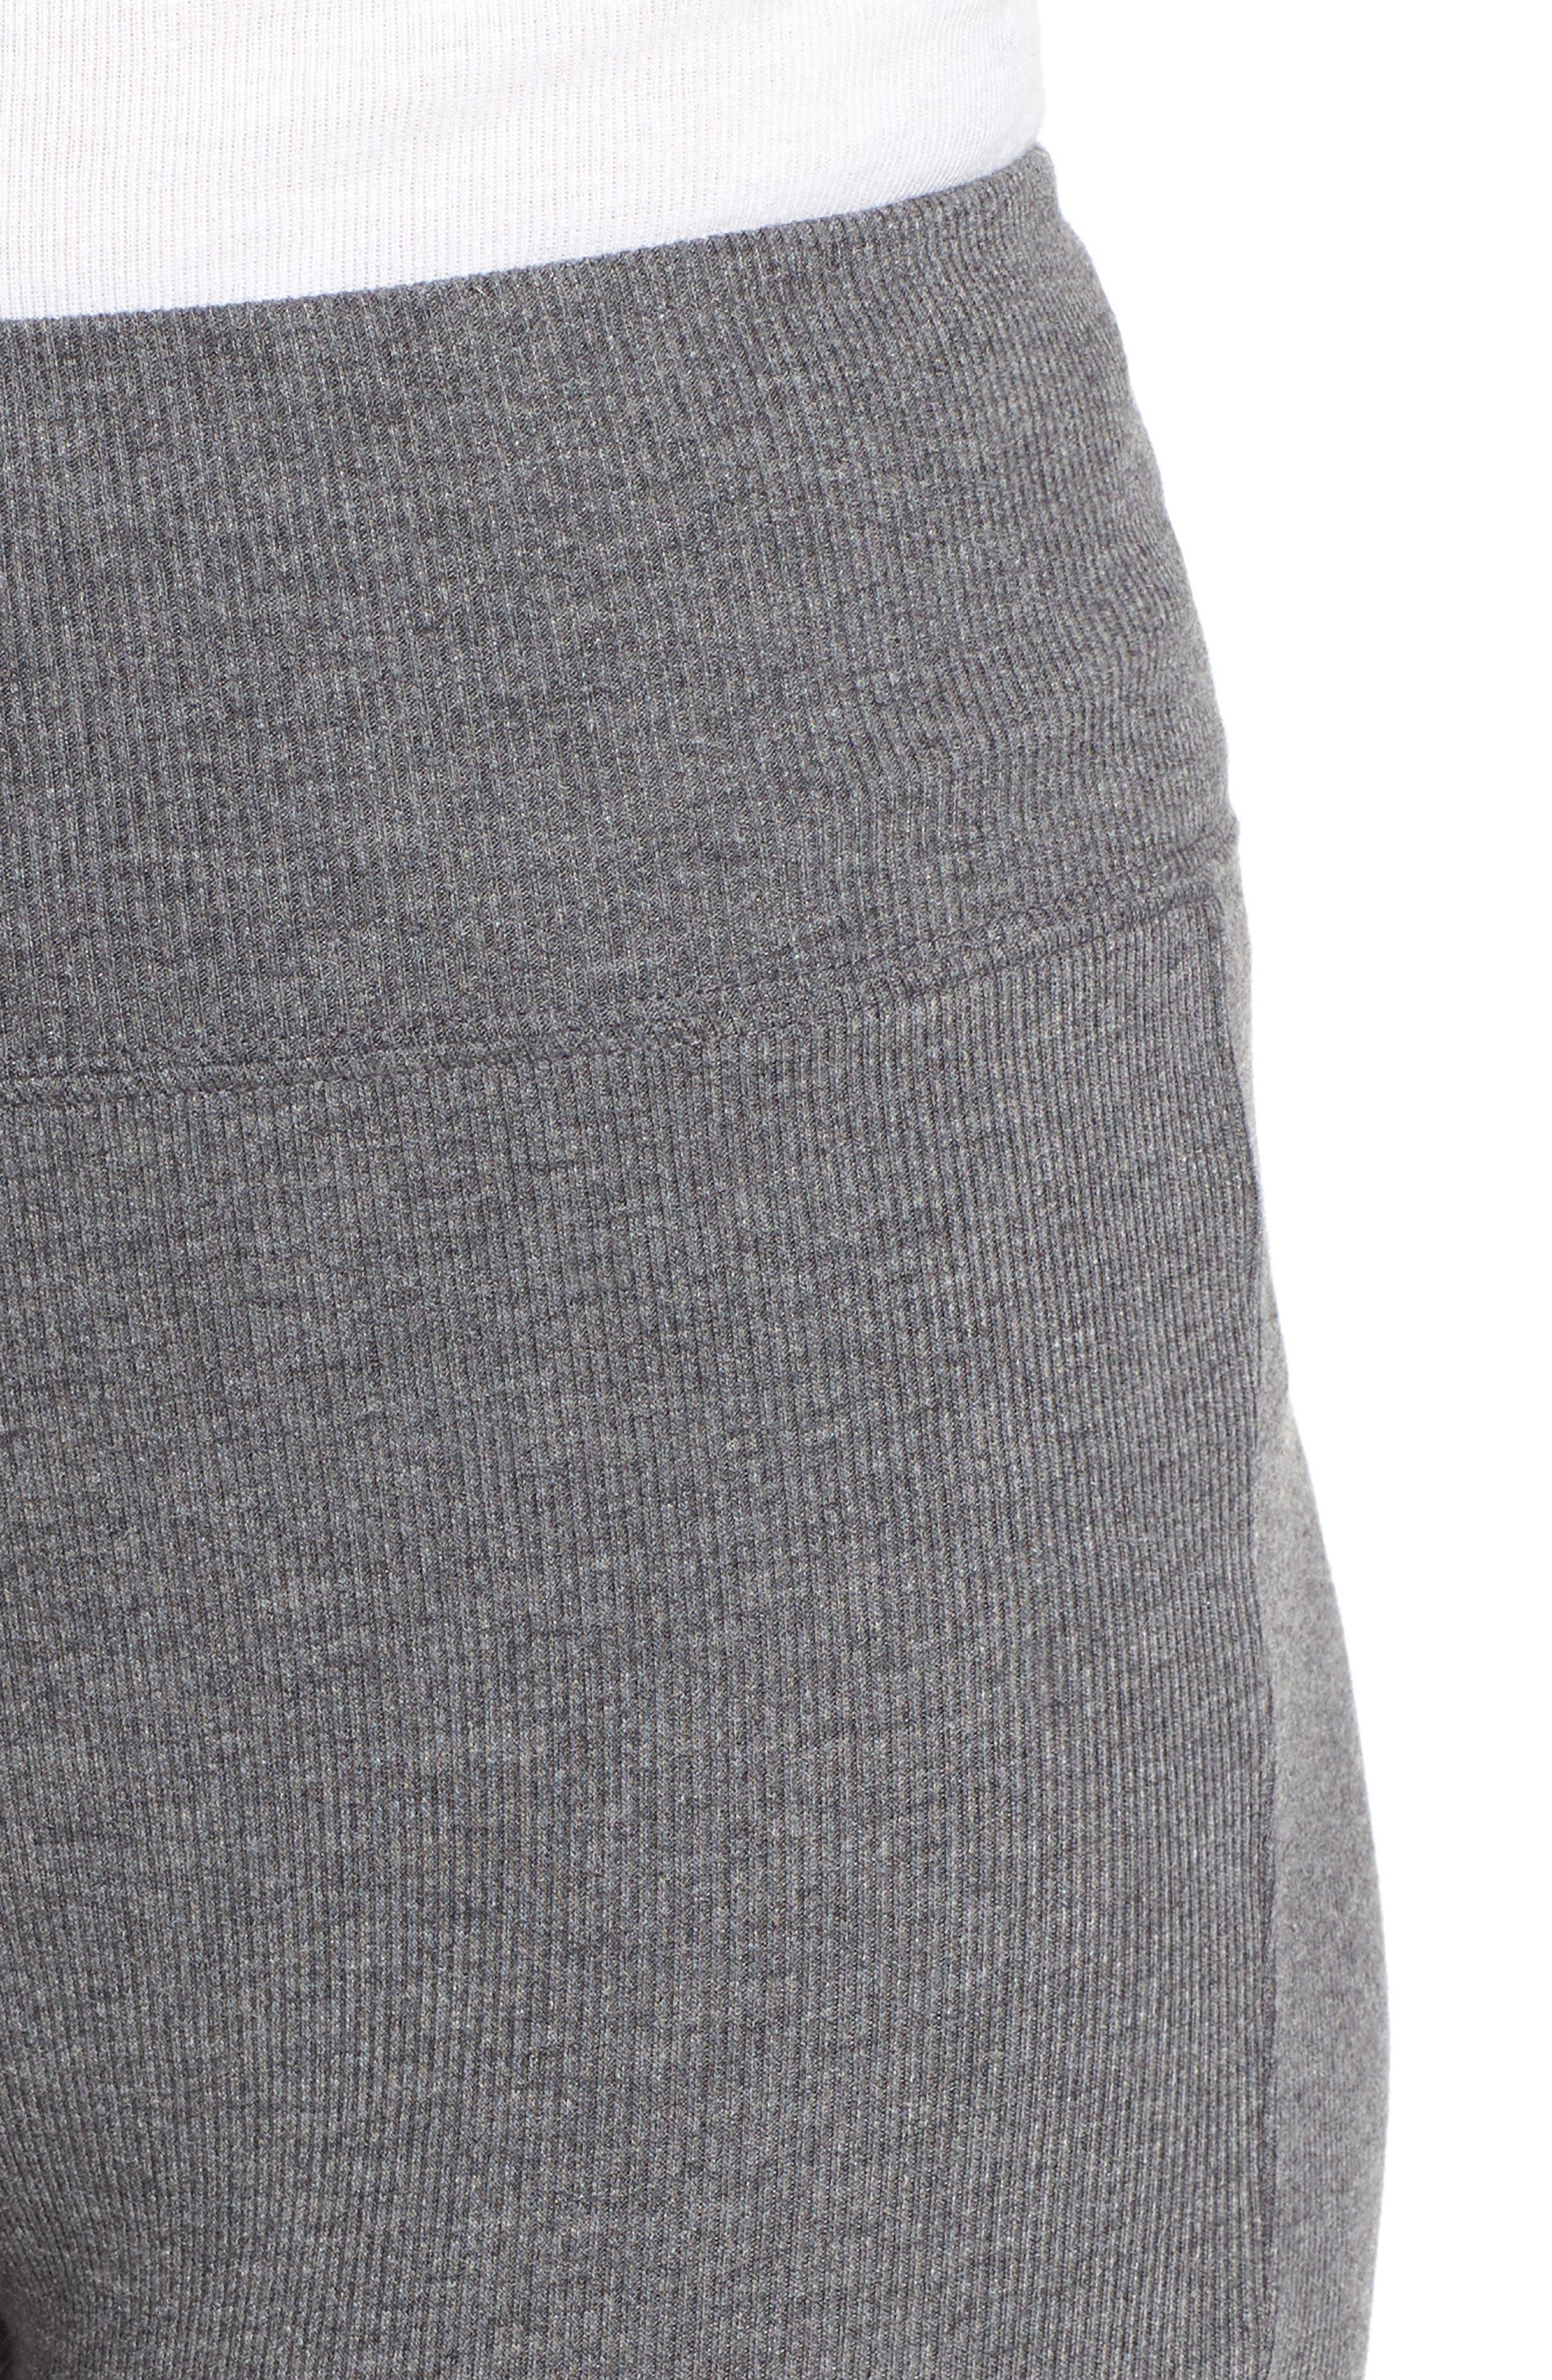 Rib Knit Leggings,                             Alternate thumbnail 6, color,                             GREY CLOUDY HEATHER